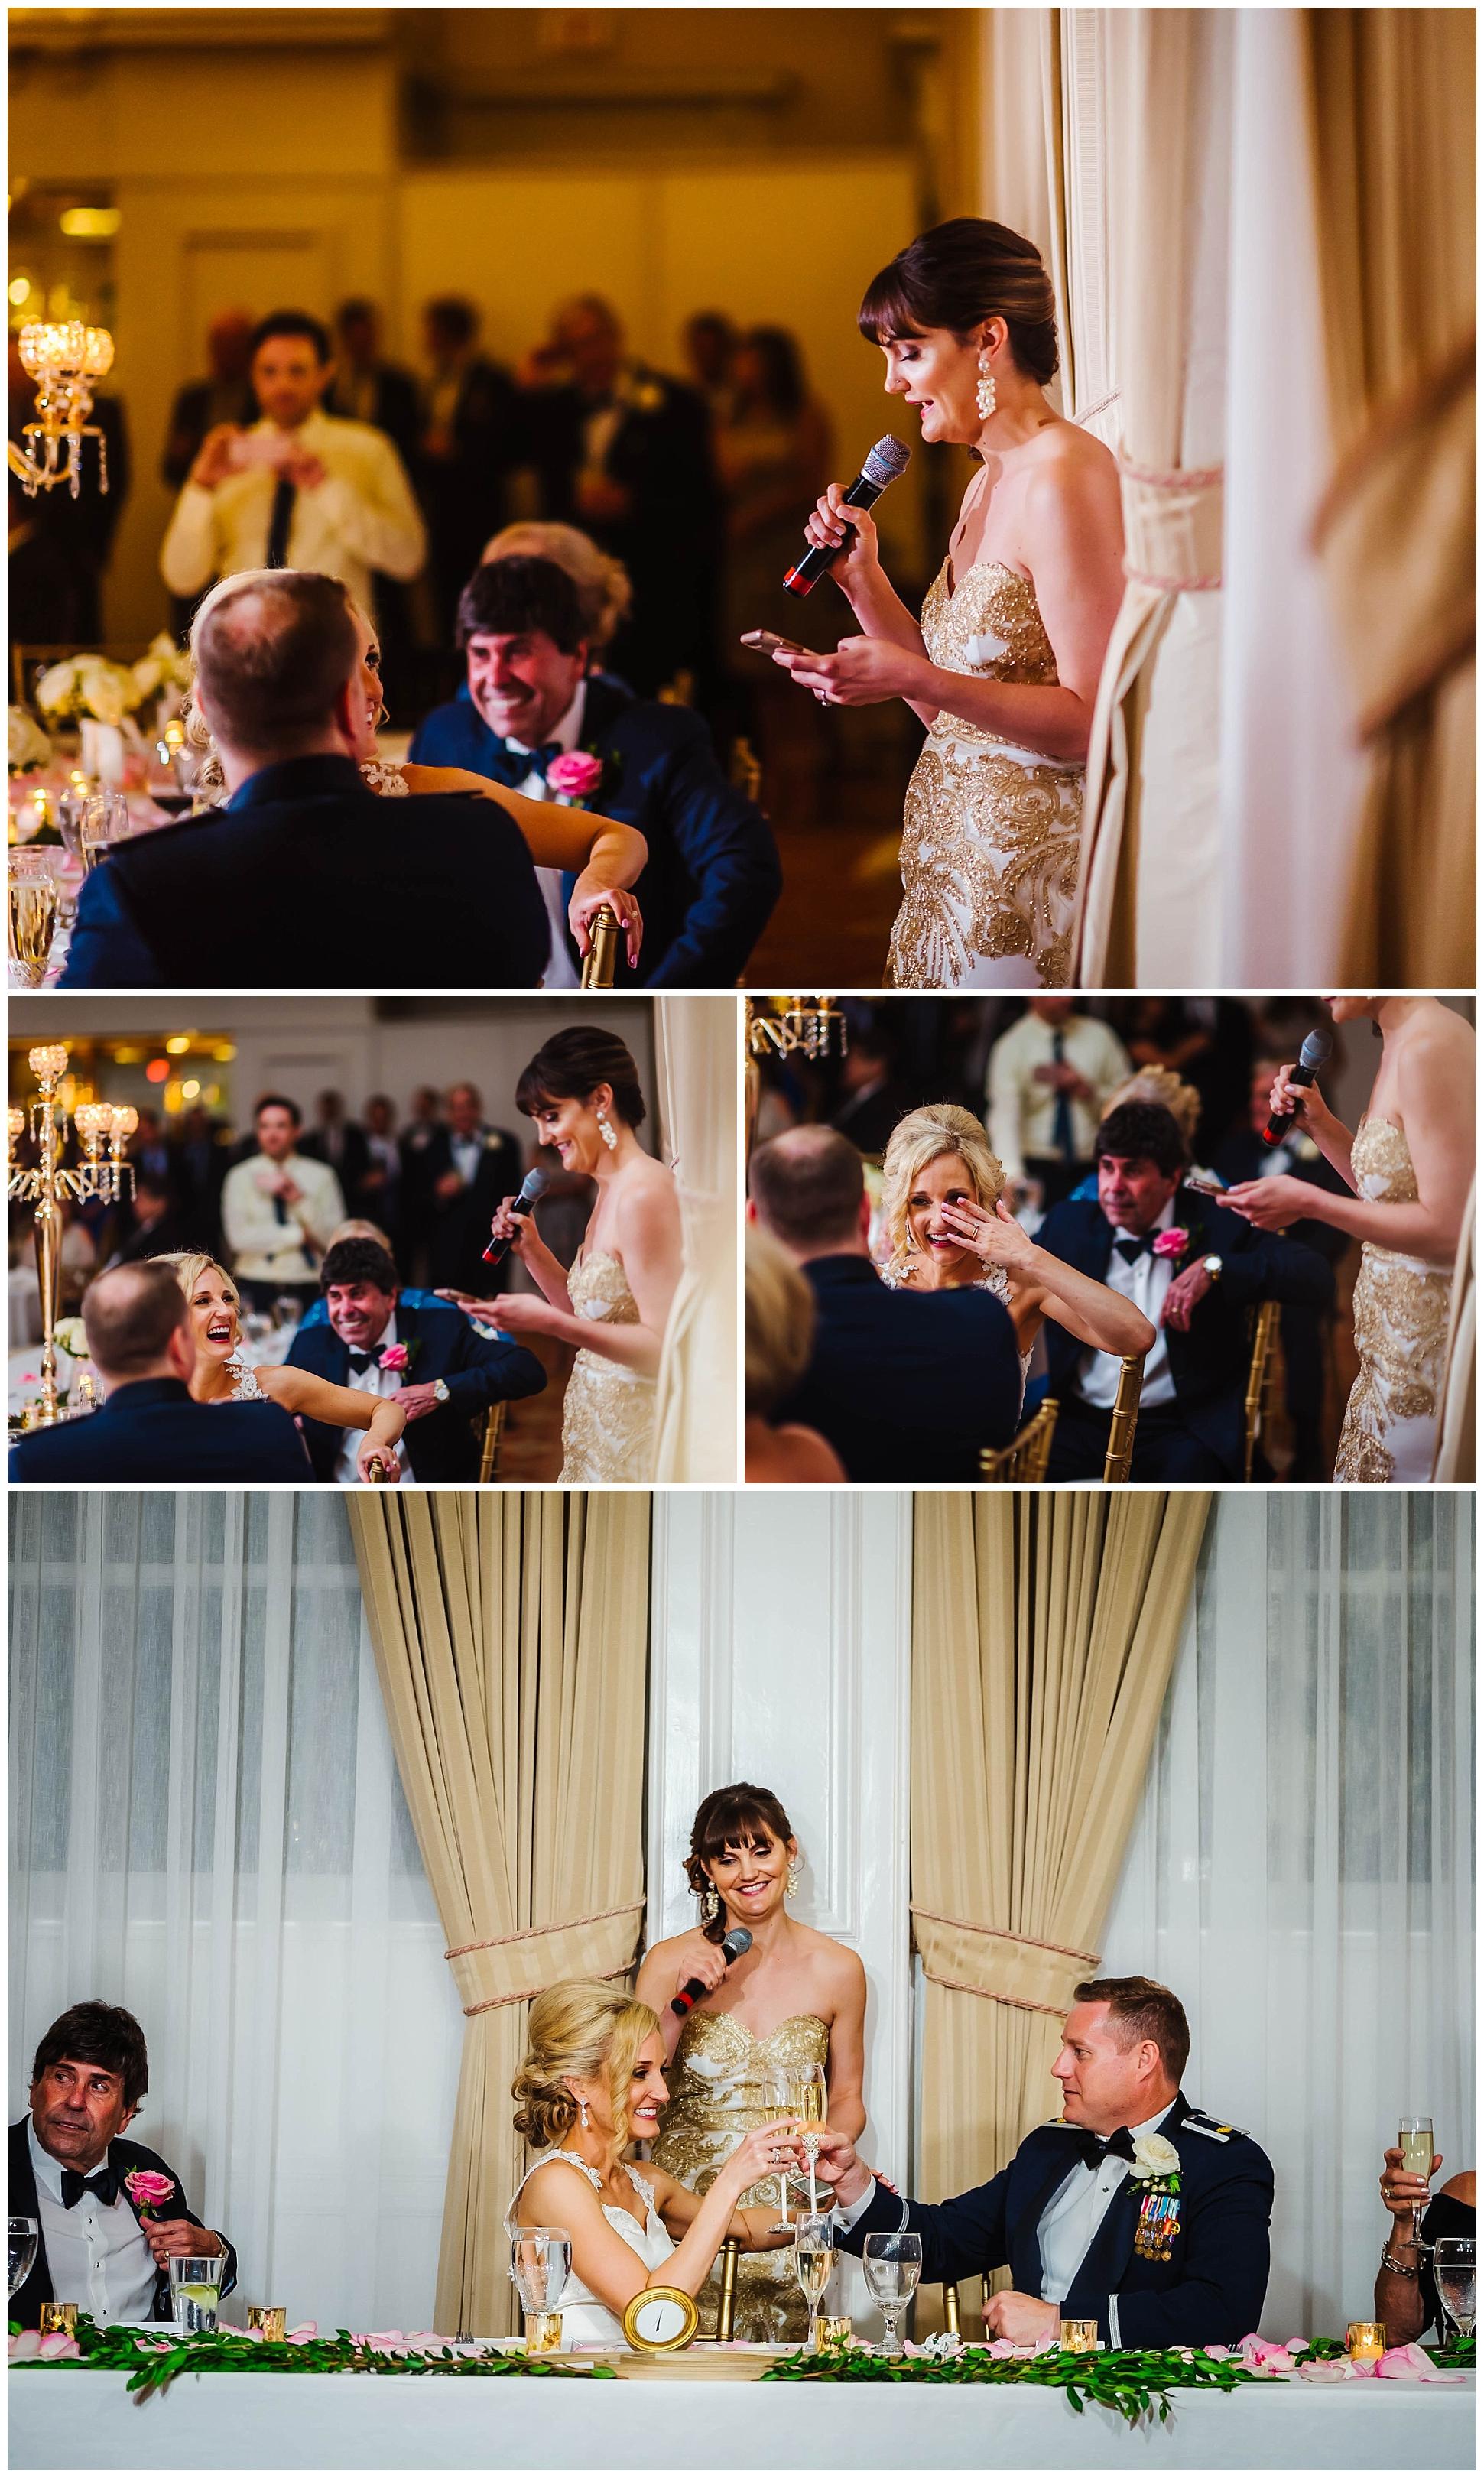 tampa-wedding-photographer-sleeves-palma-ceia-country-club-golf-course-sunset-luxury_0092.jpg